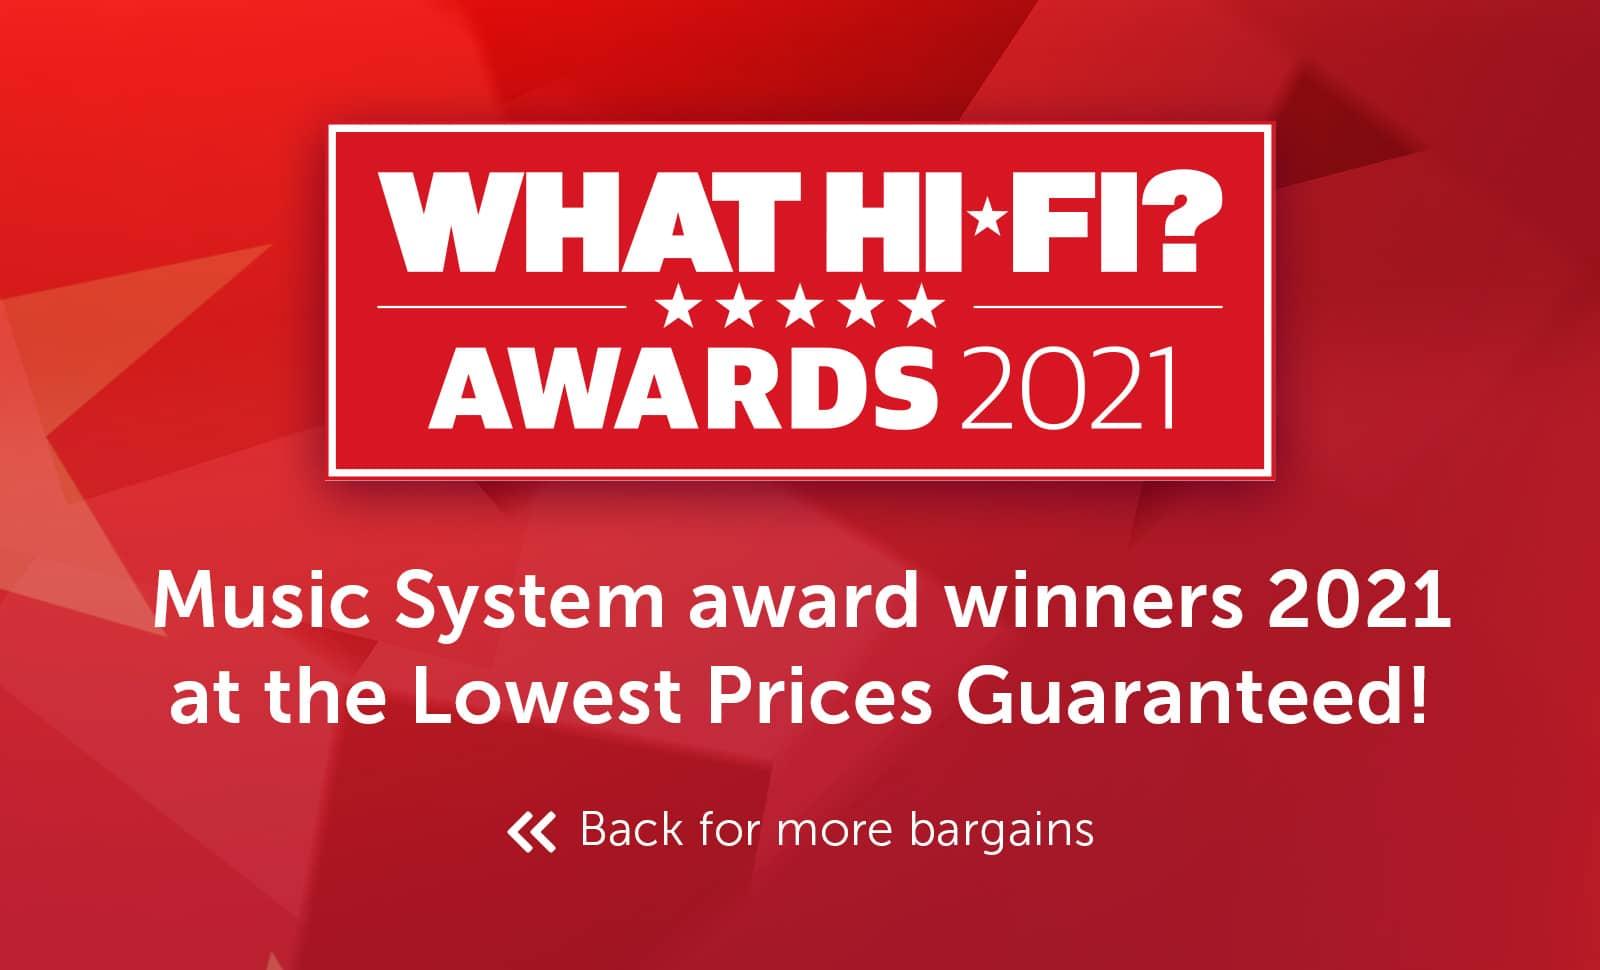 What Hi-Fi? Best Buy Awards 2021 - Music System